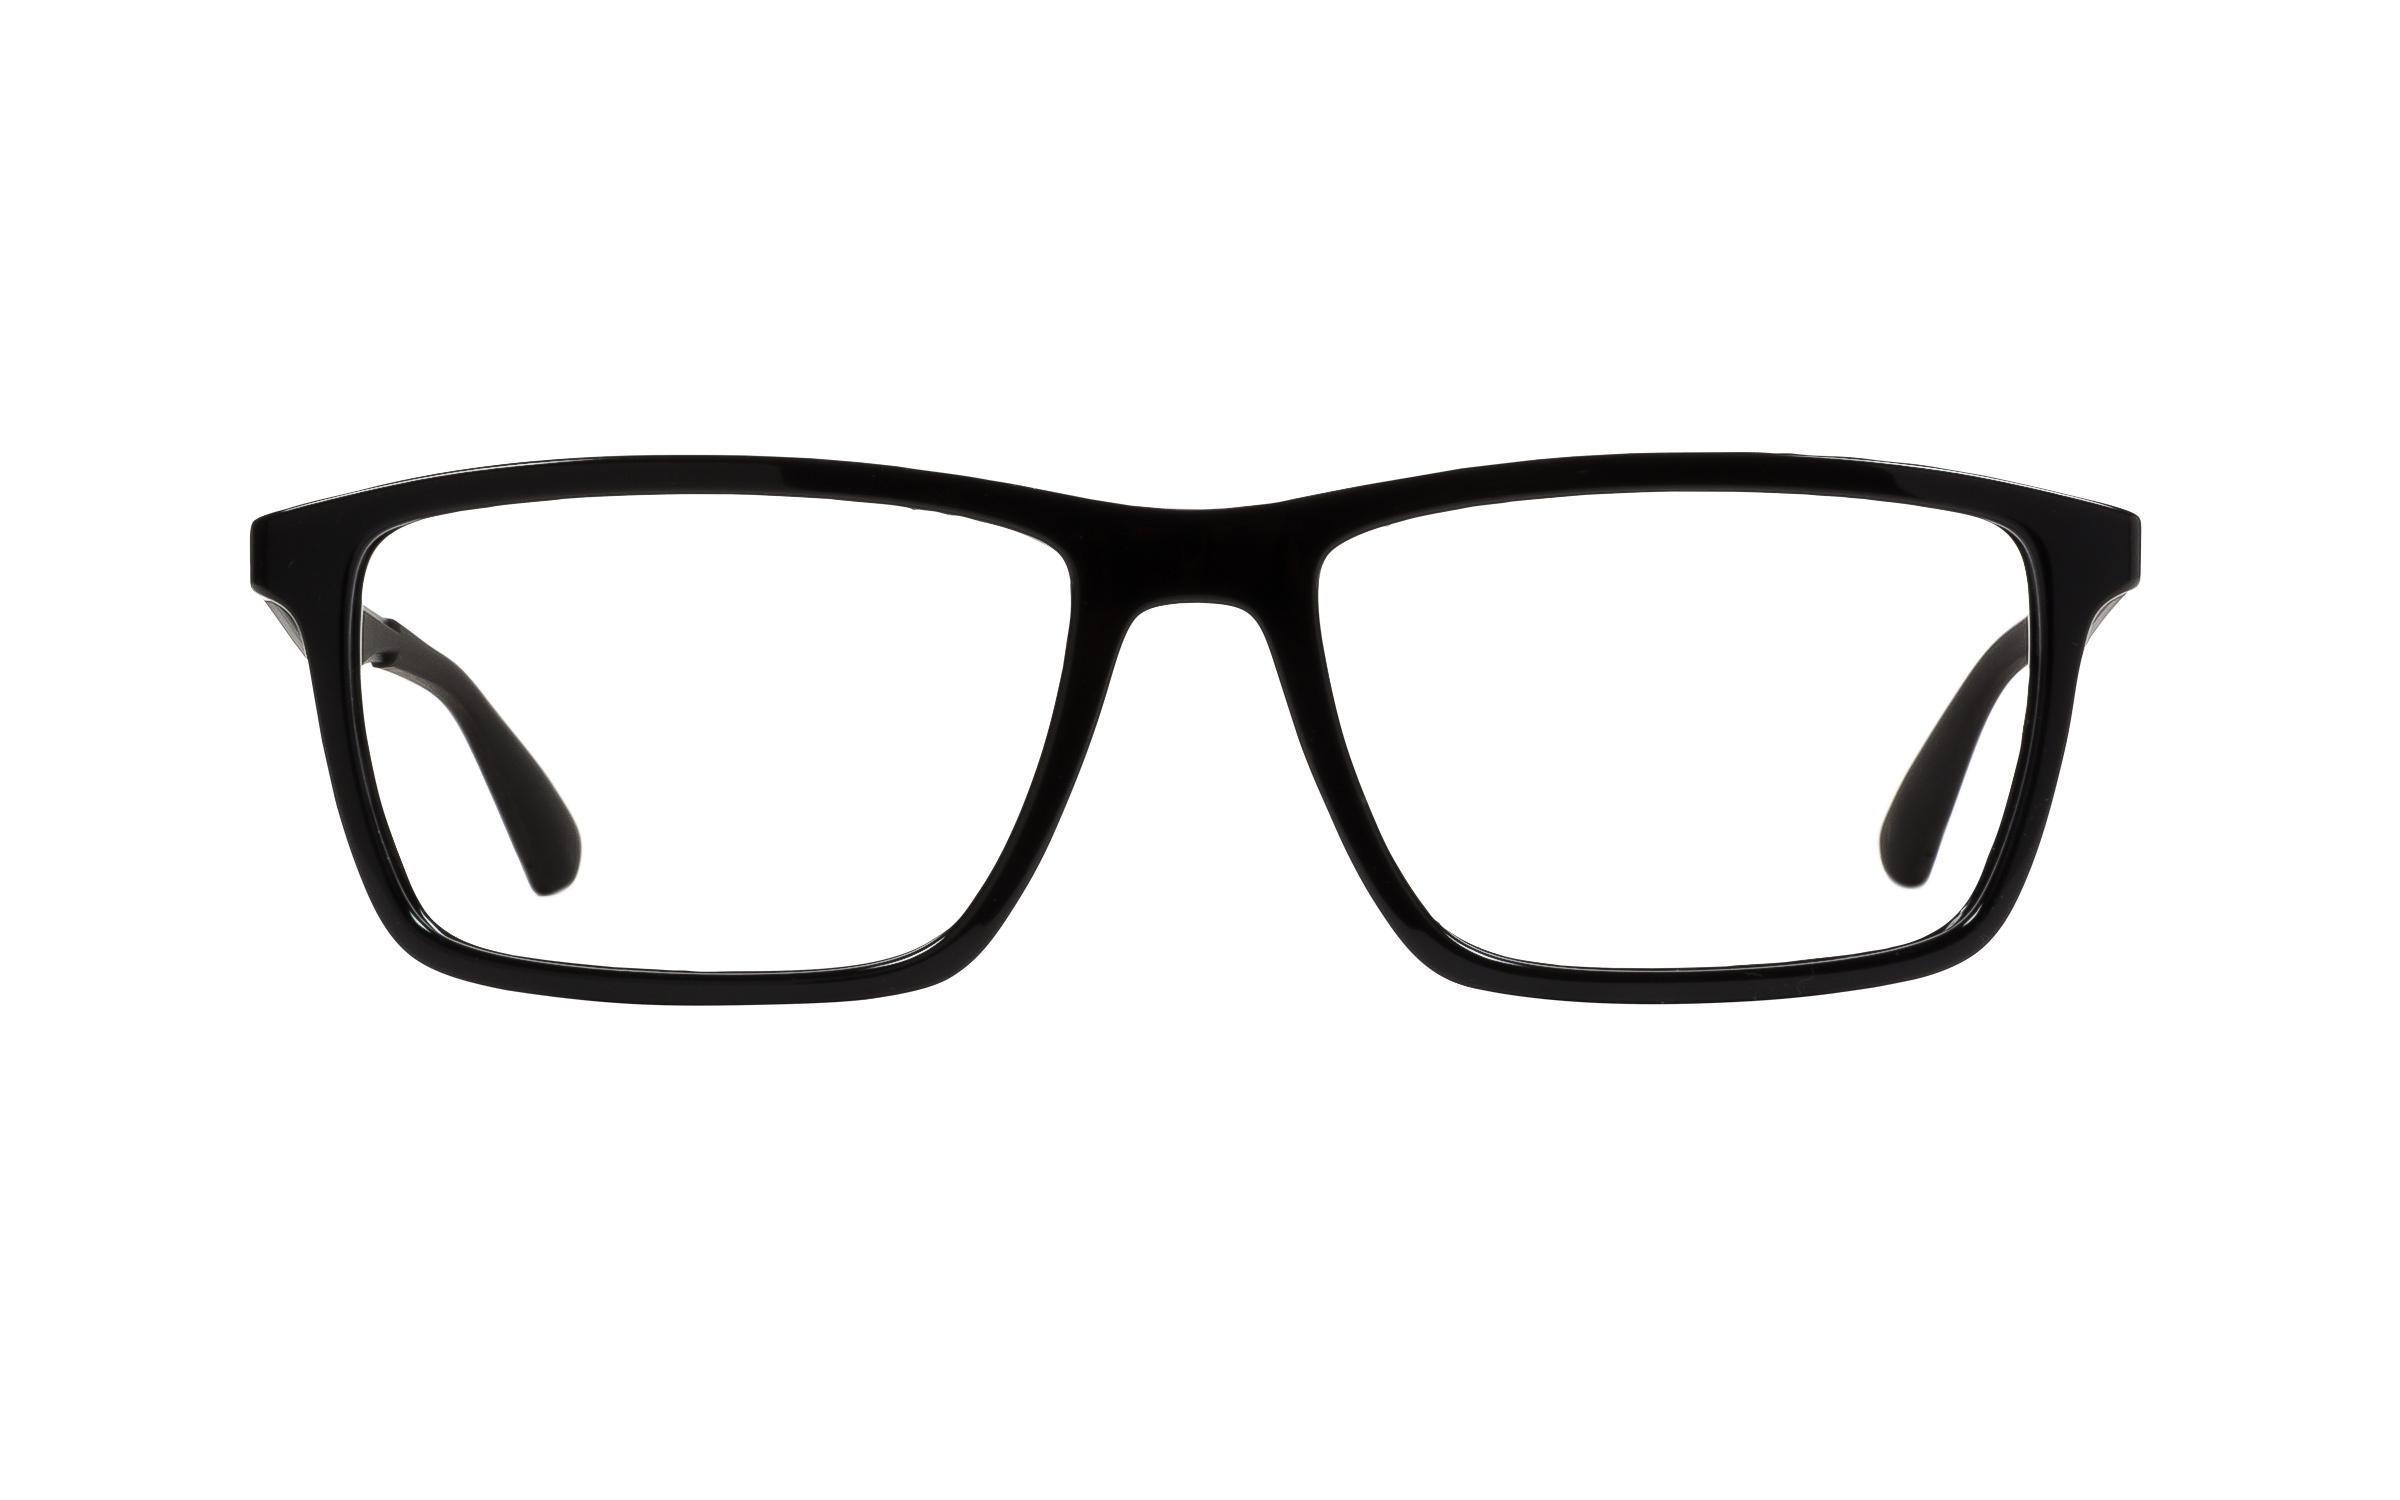 http://www.coastal.com/ - Luxottica Ray-Ban Wayfarer RB7056 2000 Eyeglasses and Frame in Shiny Black – Online Coastal